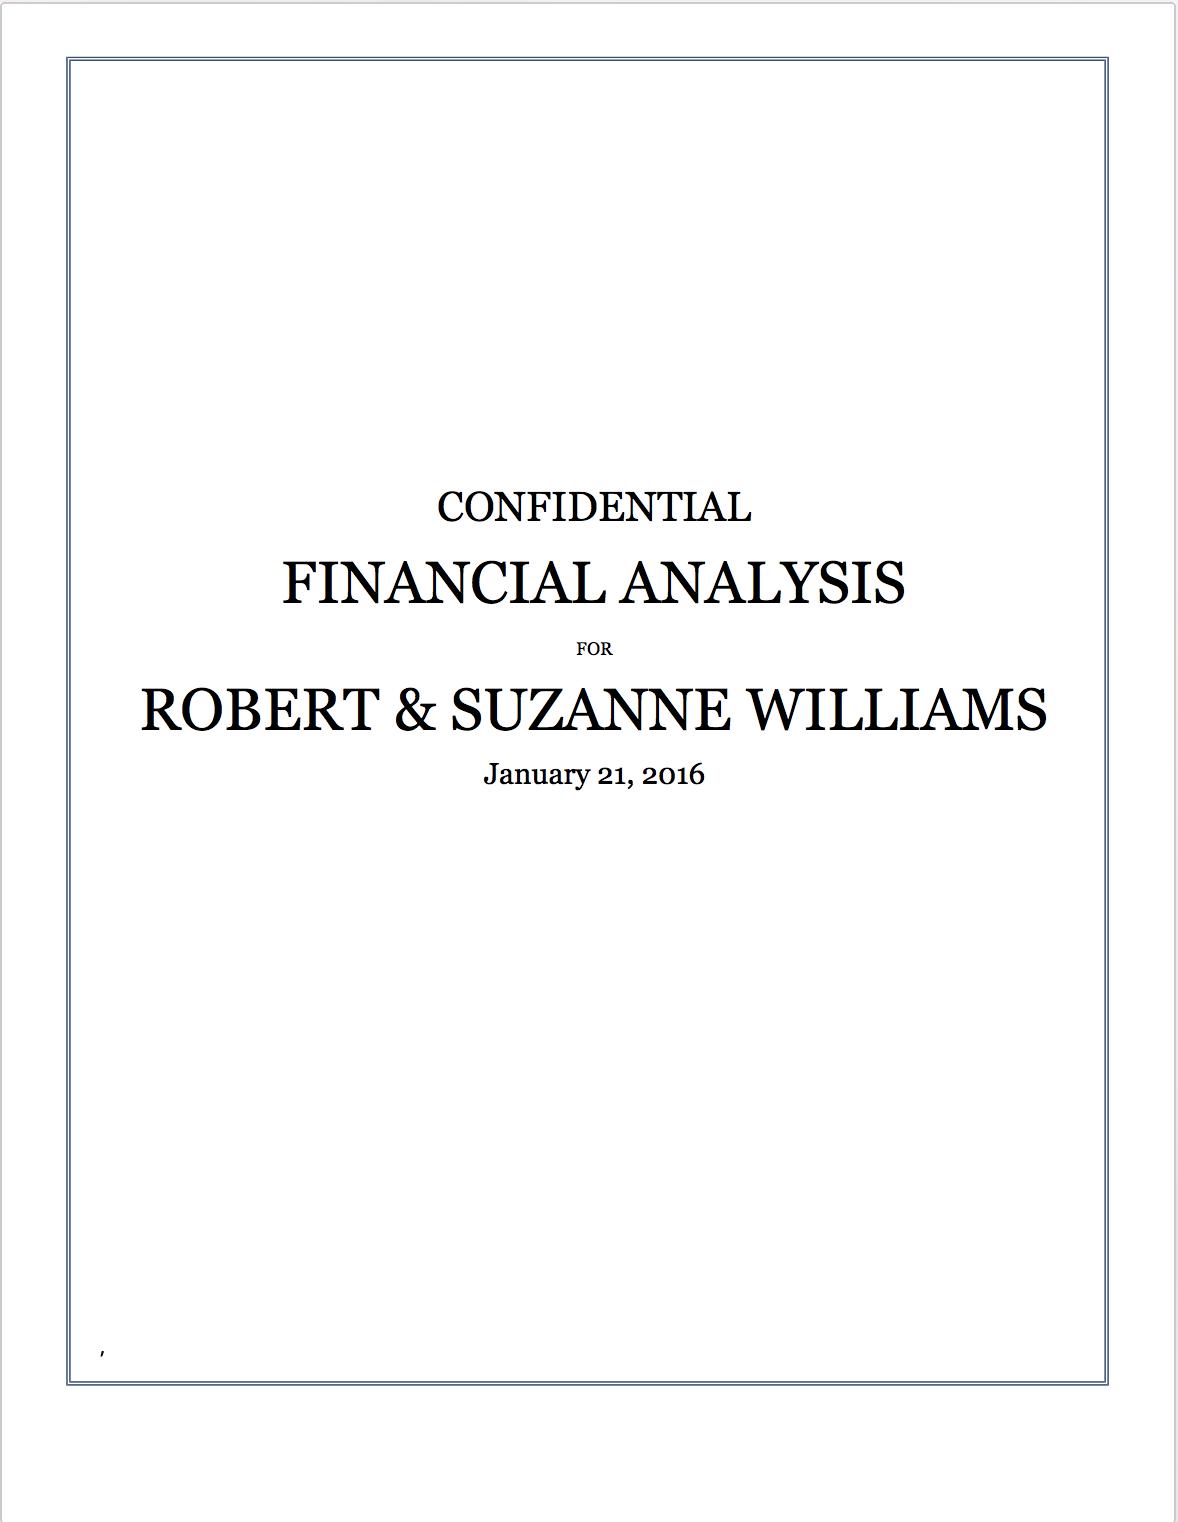 Retirement financial analysis